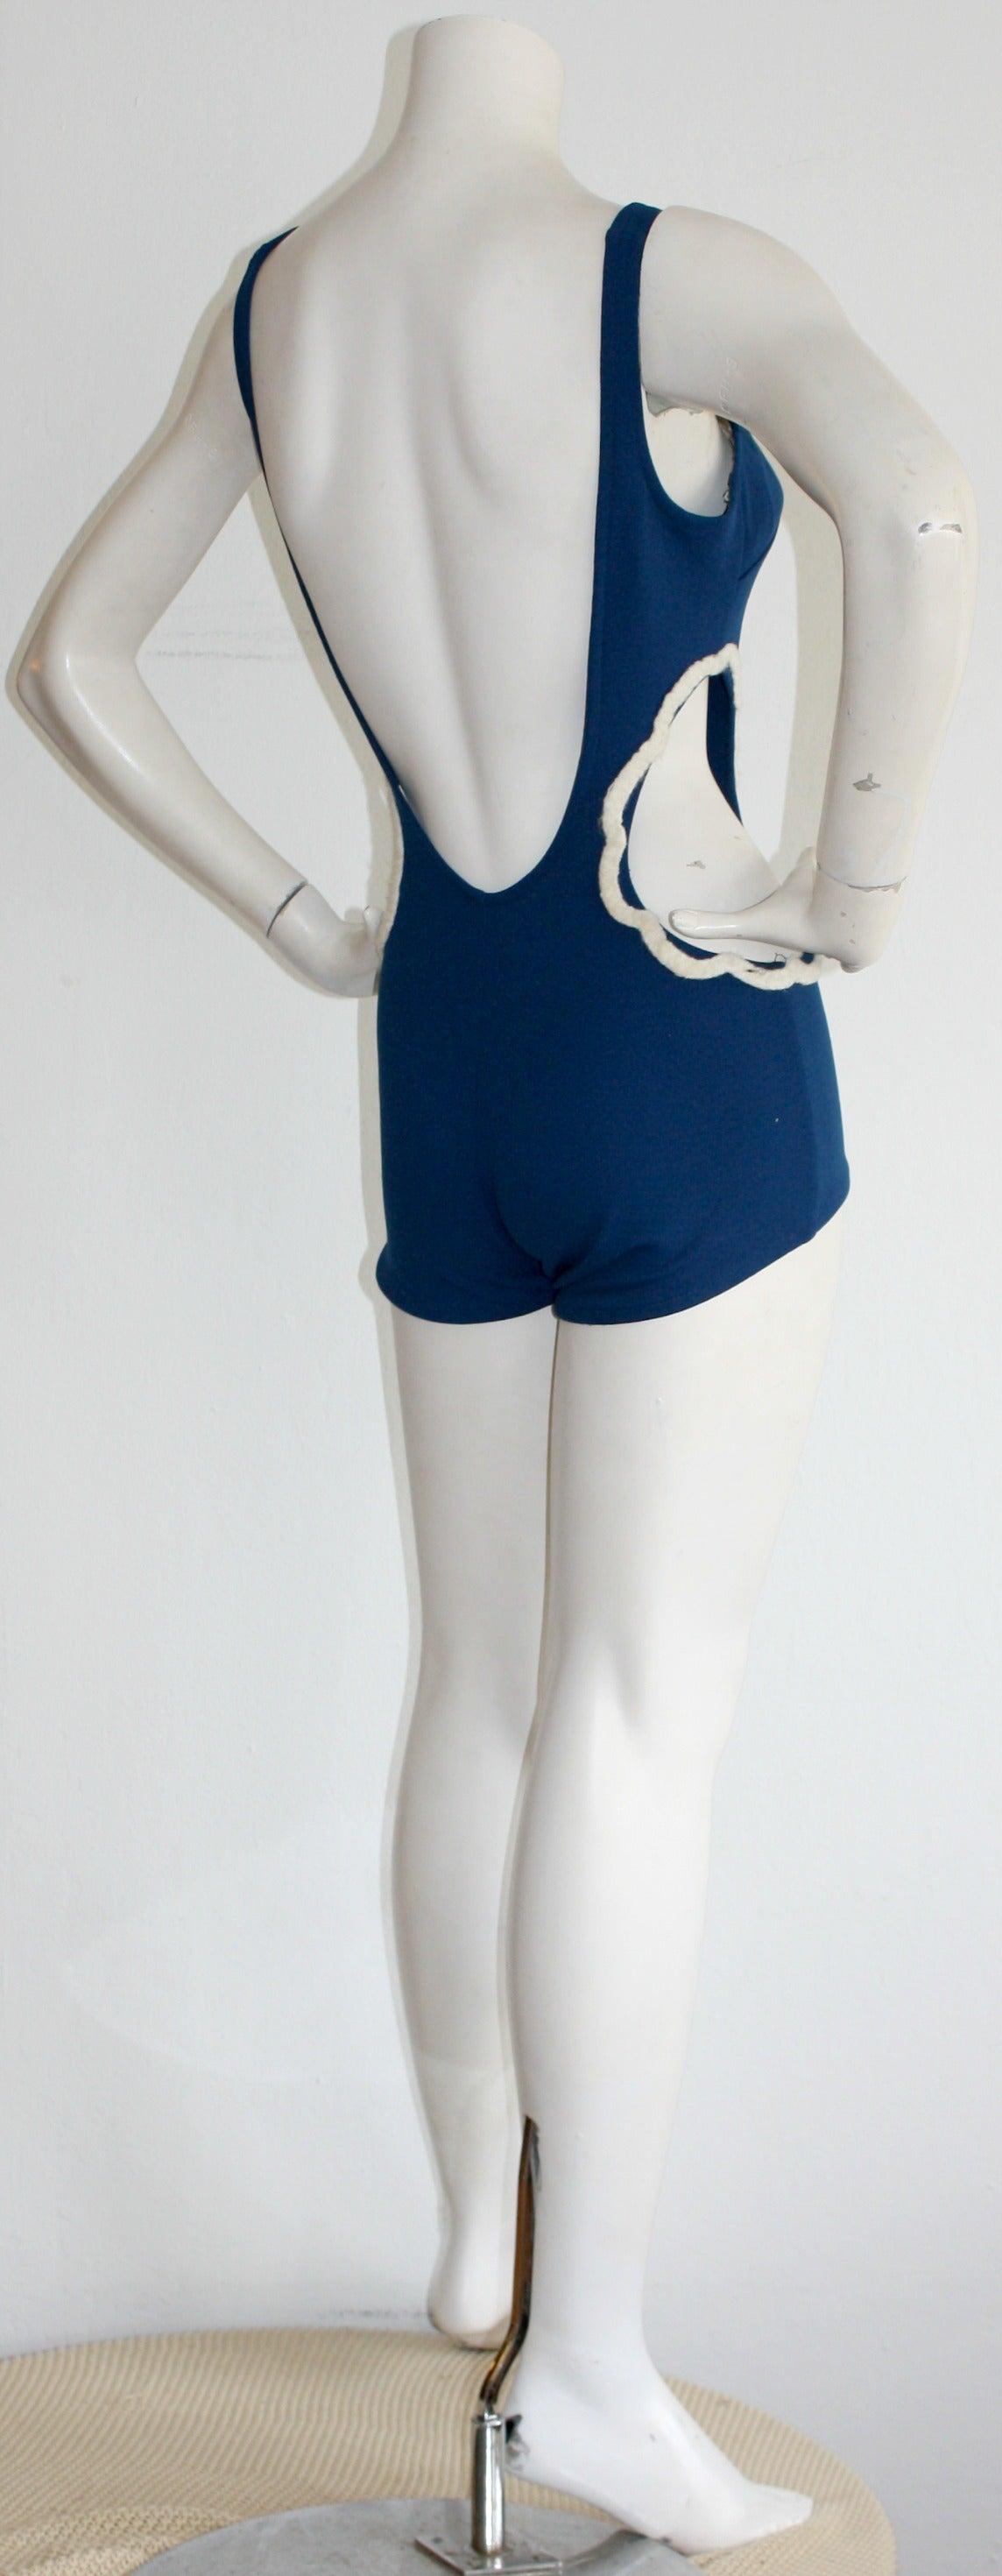 1960s Vintage Oleg Cassini ' Peter Pan ' Space Age Cut-Out Swimsuit For Sale 2